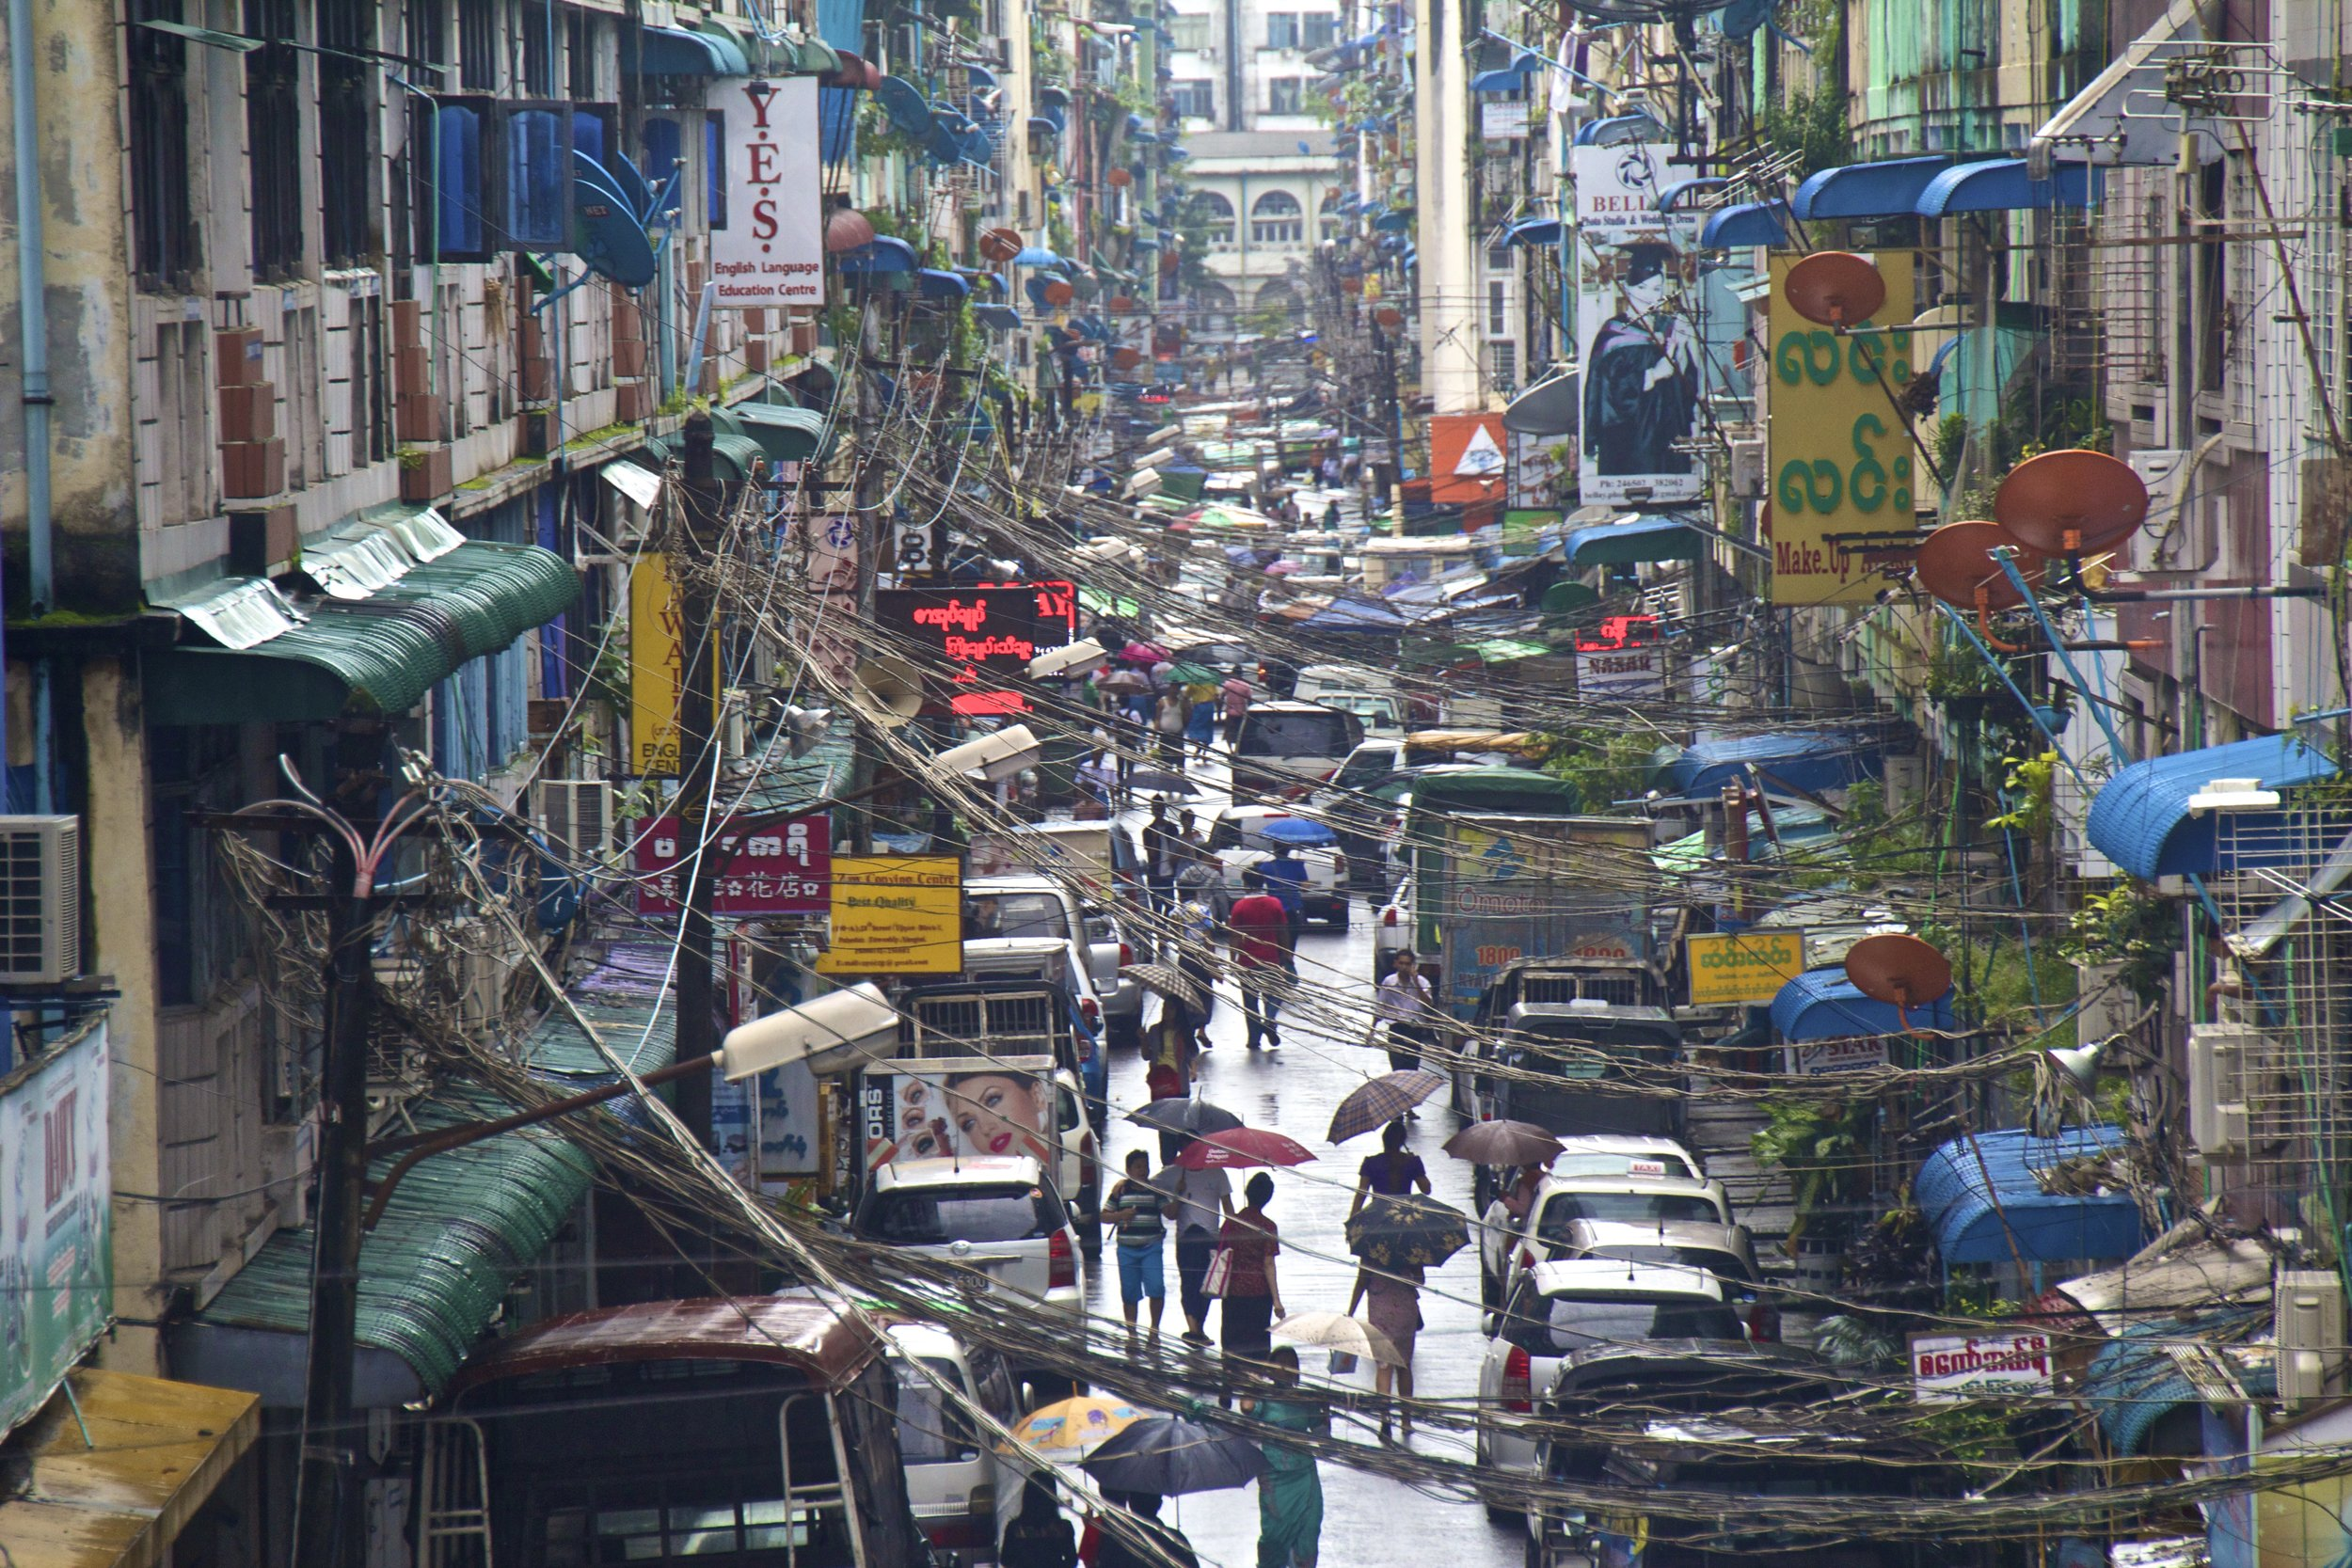 rangoon burma yangon myanmar 20.jpg